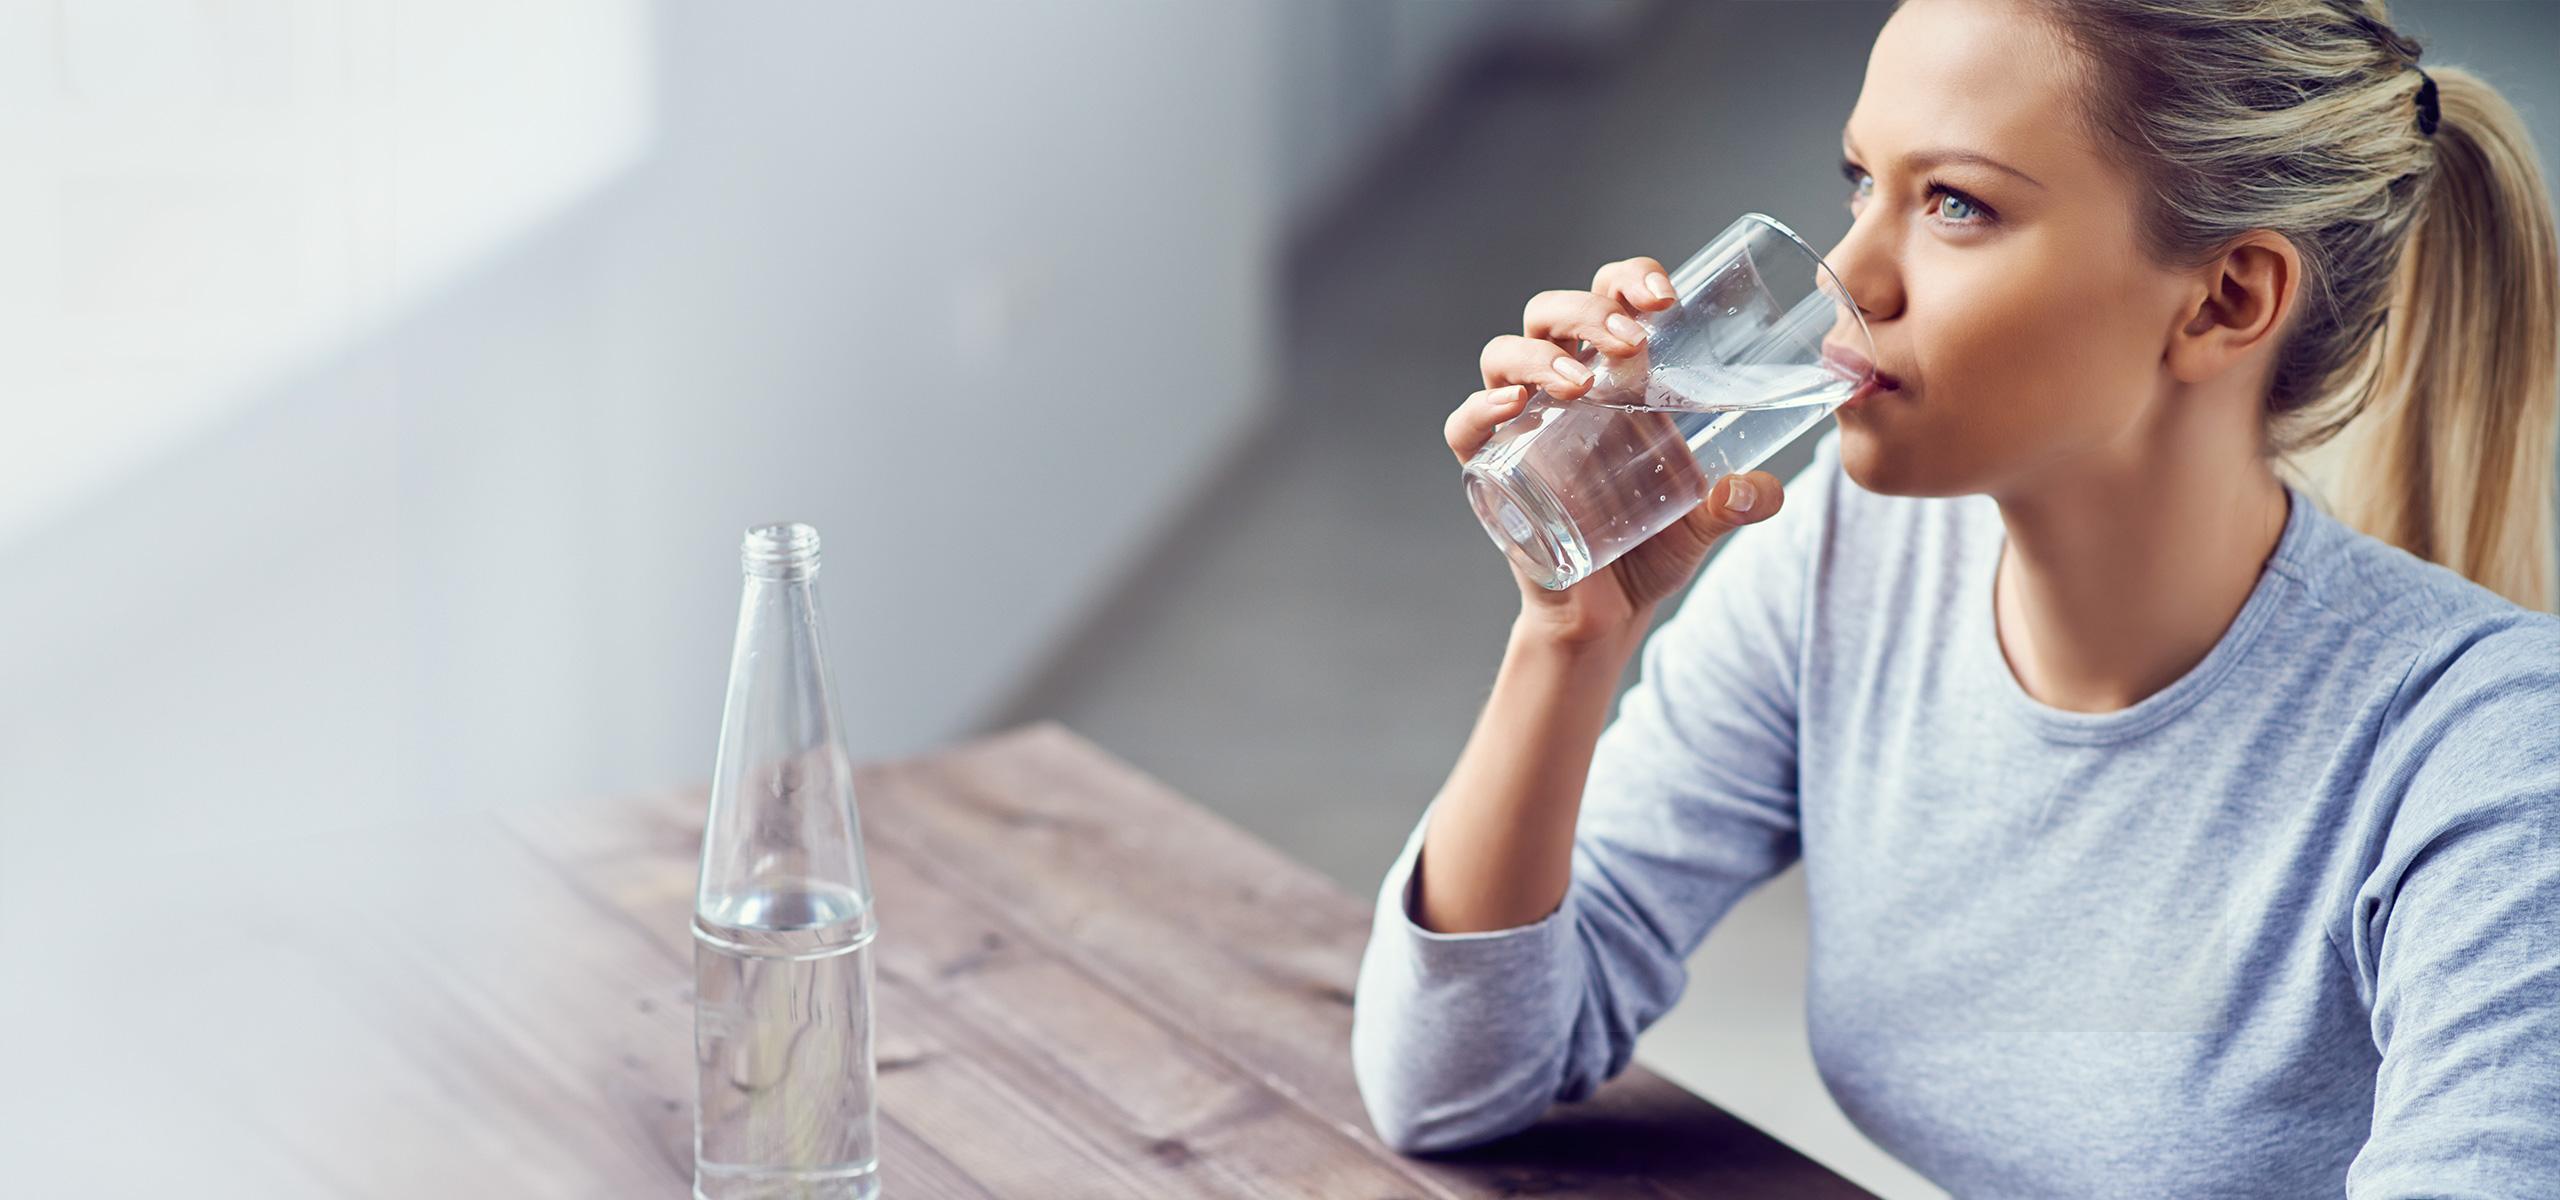 BRITA besoins hydratation personnels femme buvant